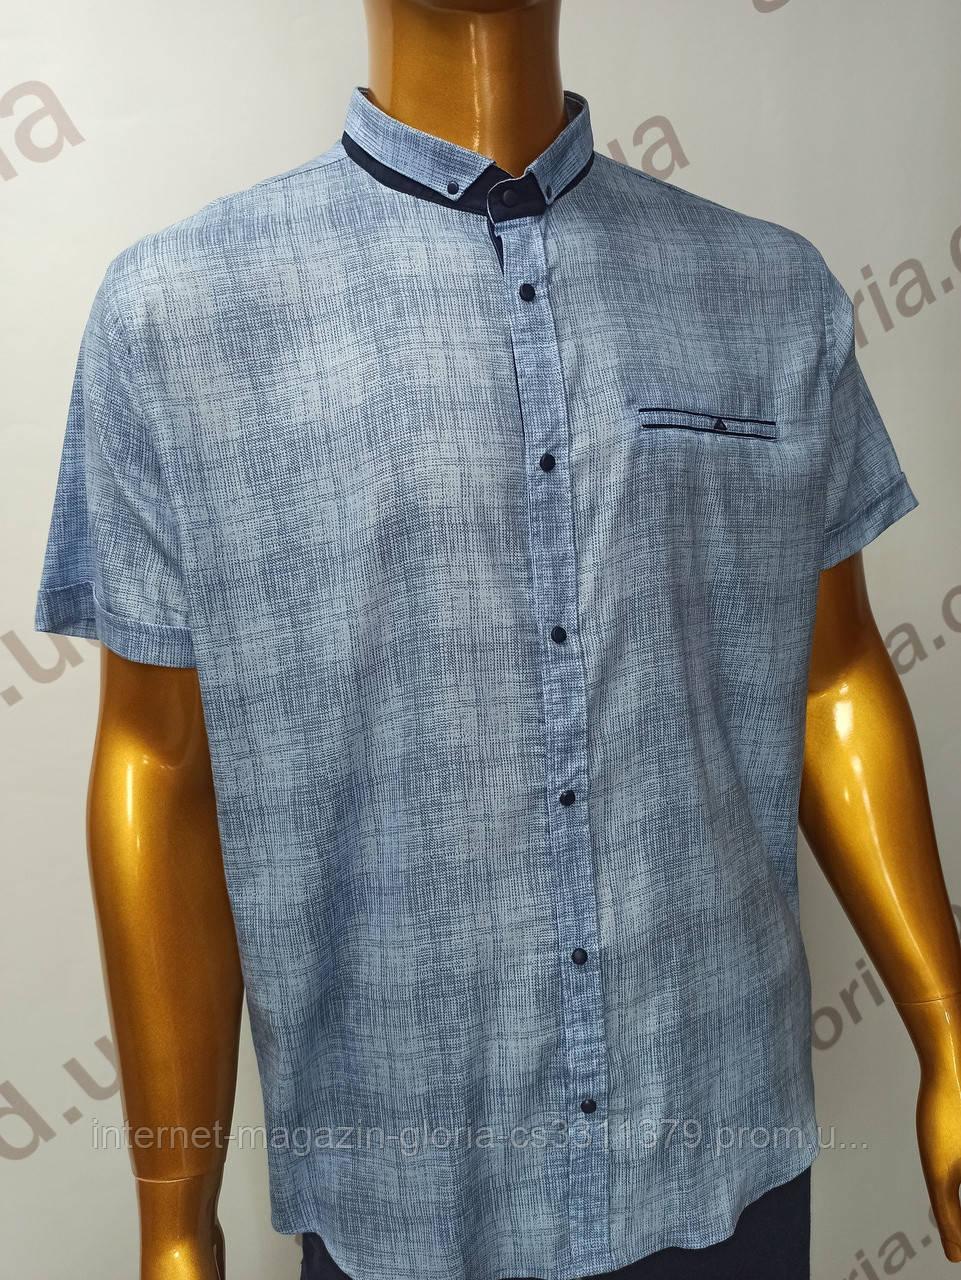 Мужская рубашка Amato. AG  29744(se). Батал. Размеры: 2XL,3XL,4XL,5XL.